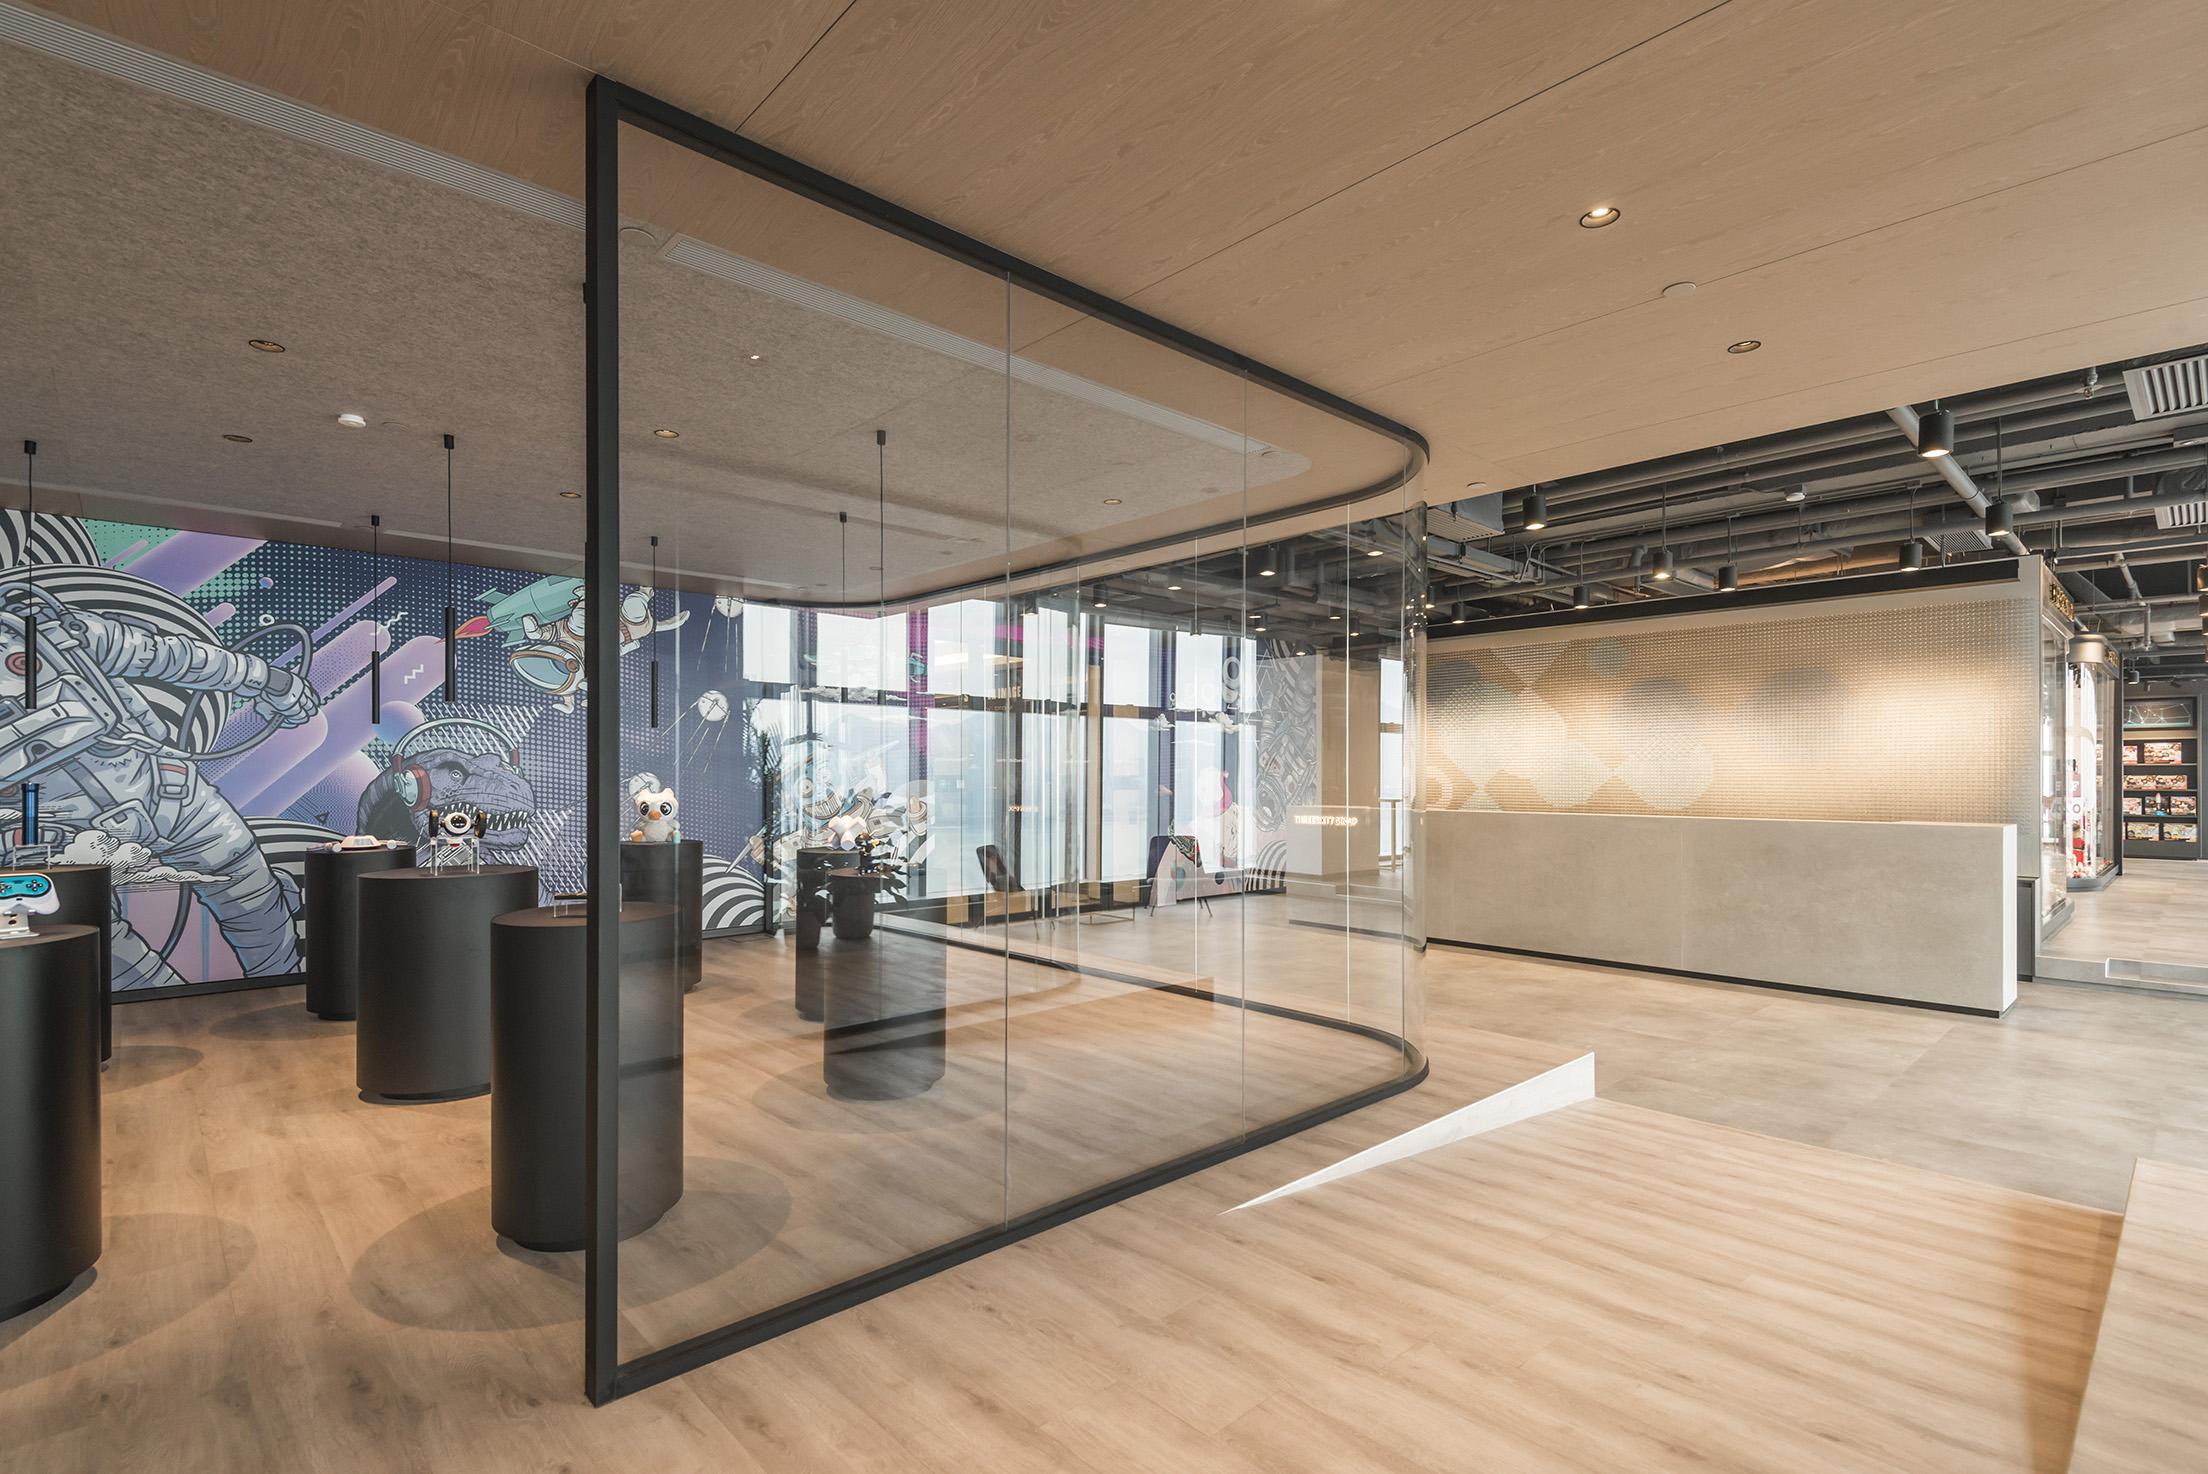 jeb-partitions-summit-threesixty-office-hk-04.jpg